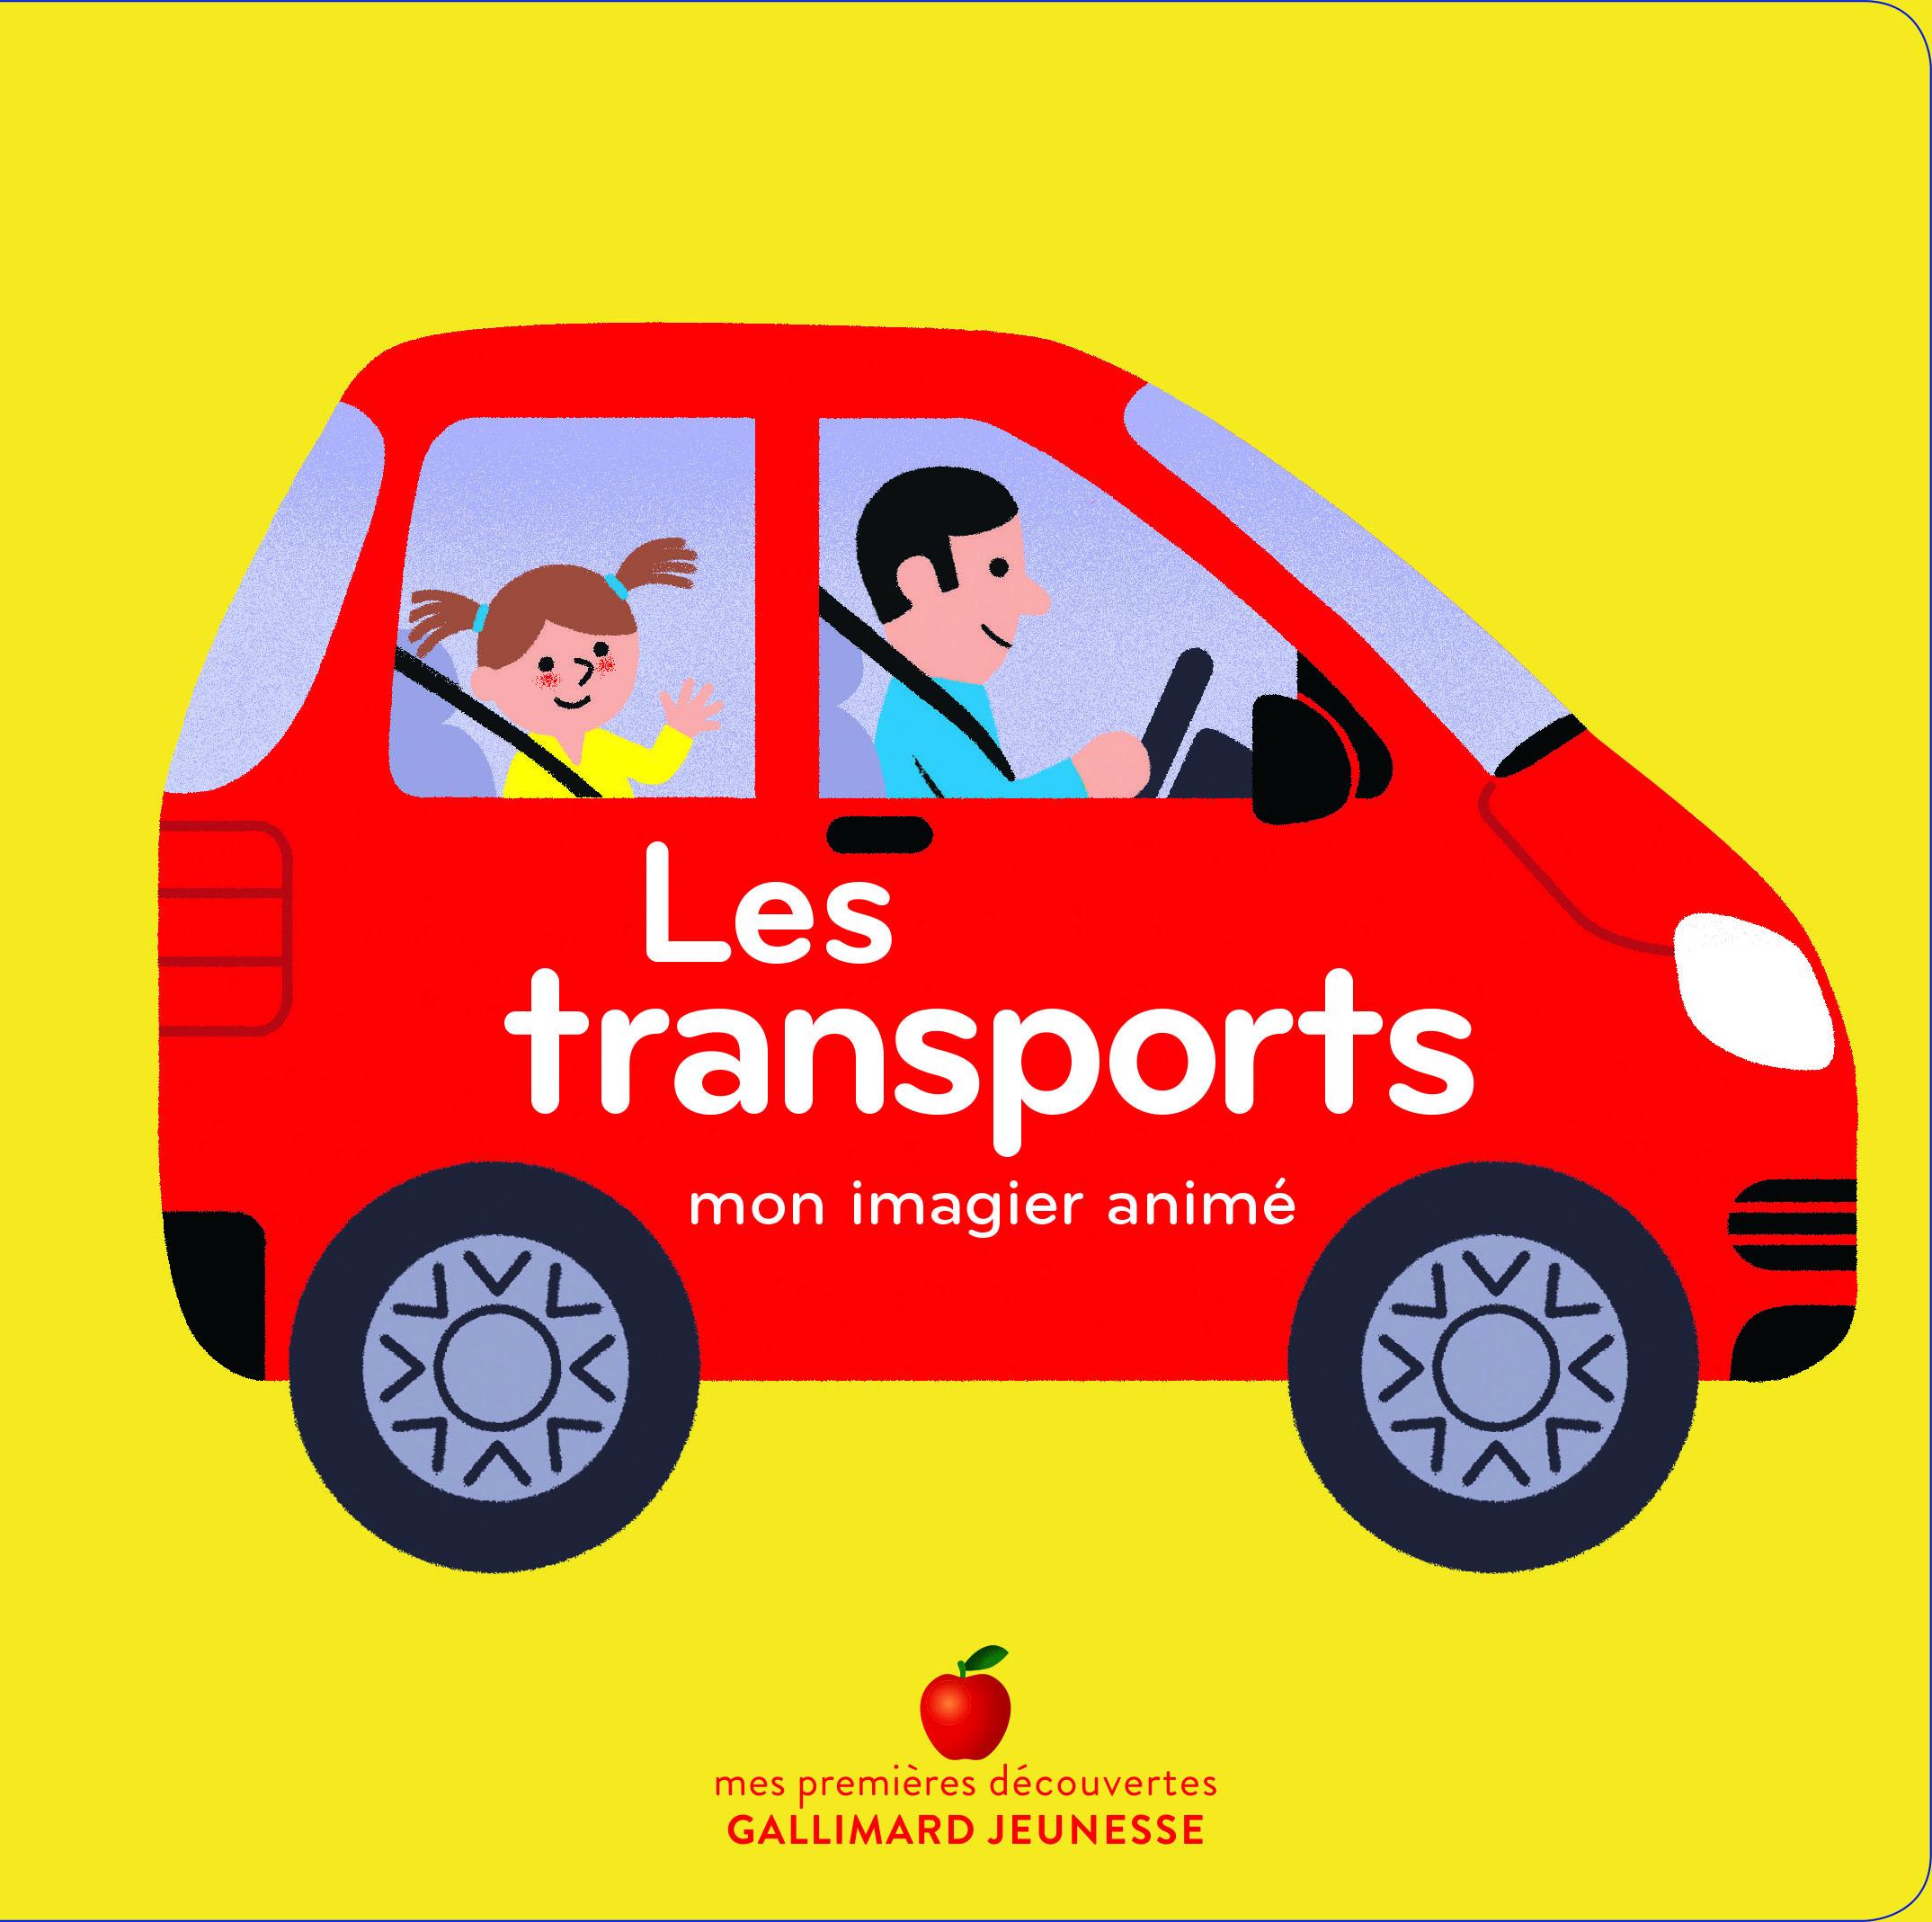 LES TRANSPORTS - MON IMAGIER ANIME